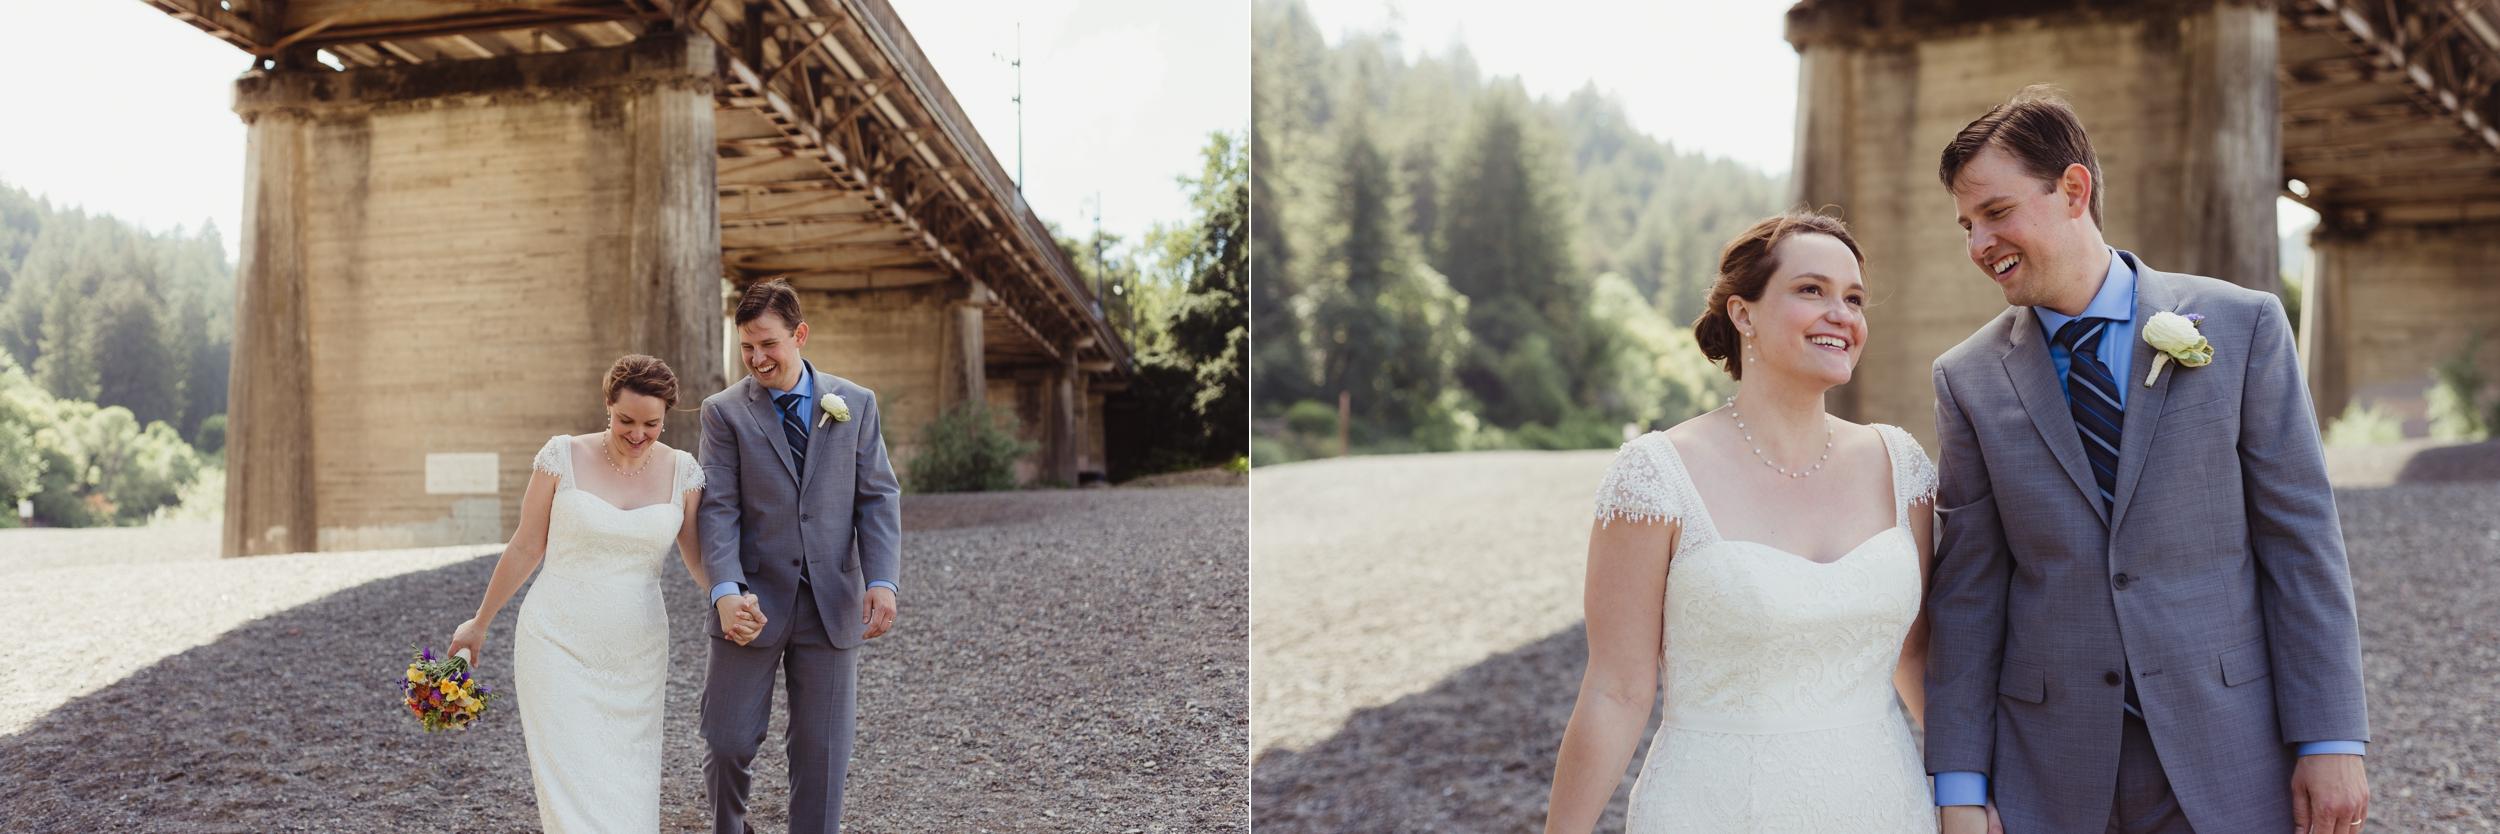 054-highland-dell-lodge-russian-river-wedding-vivianchen-385_WEB.jpg